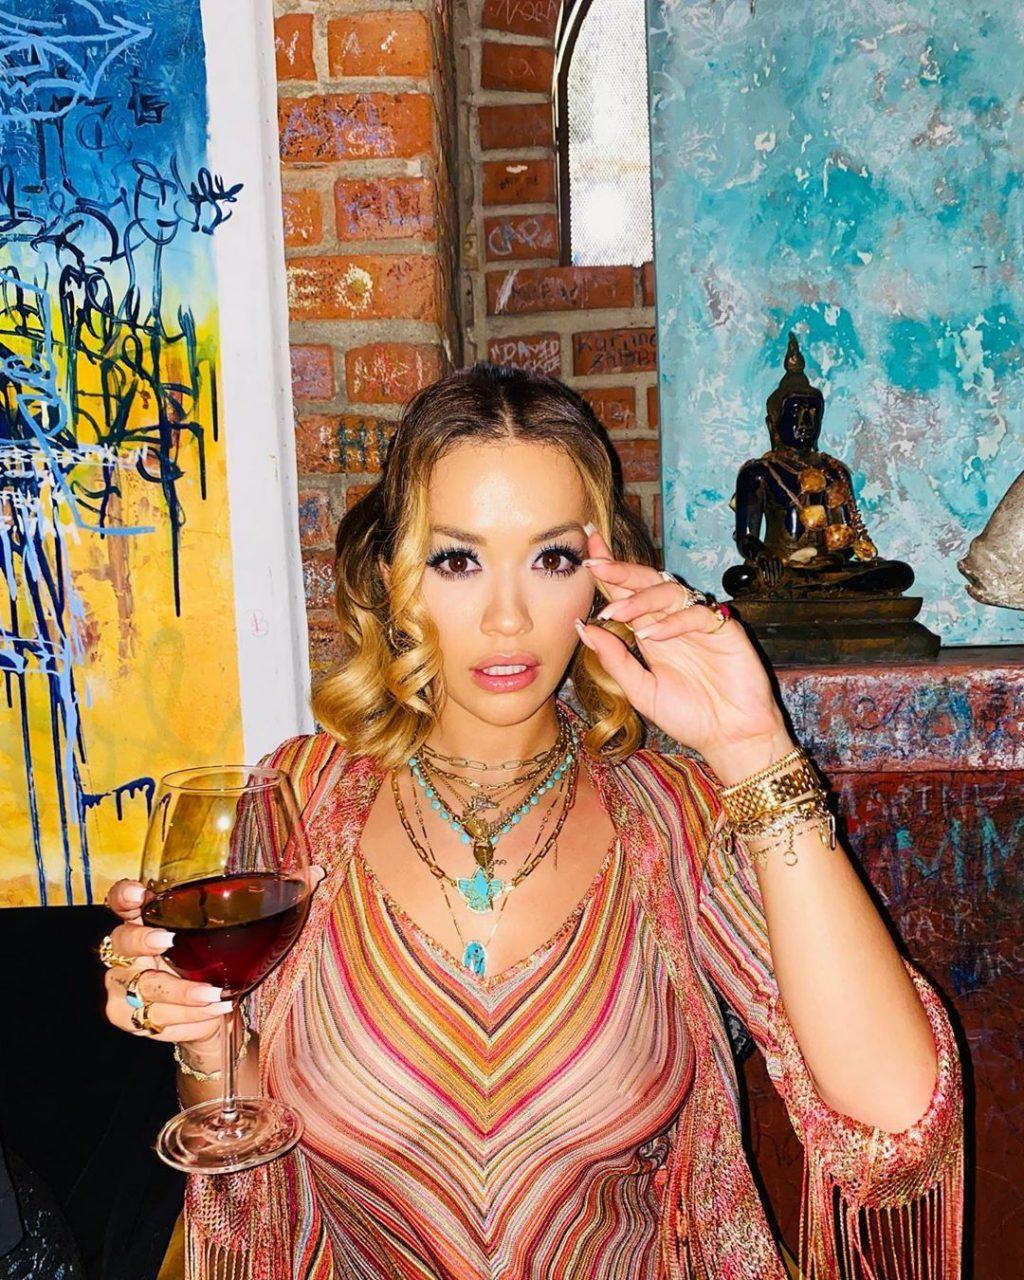 Rita Ora See Through (2 Hot Pics)